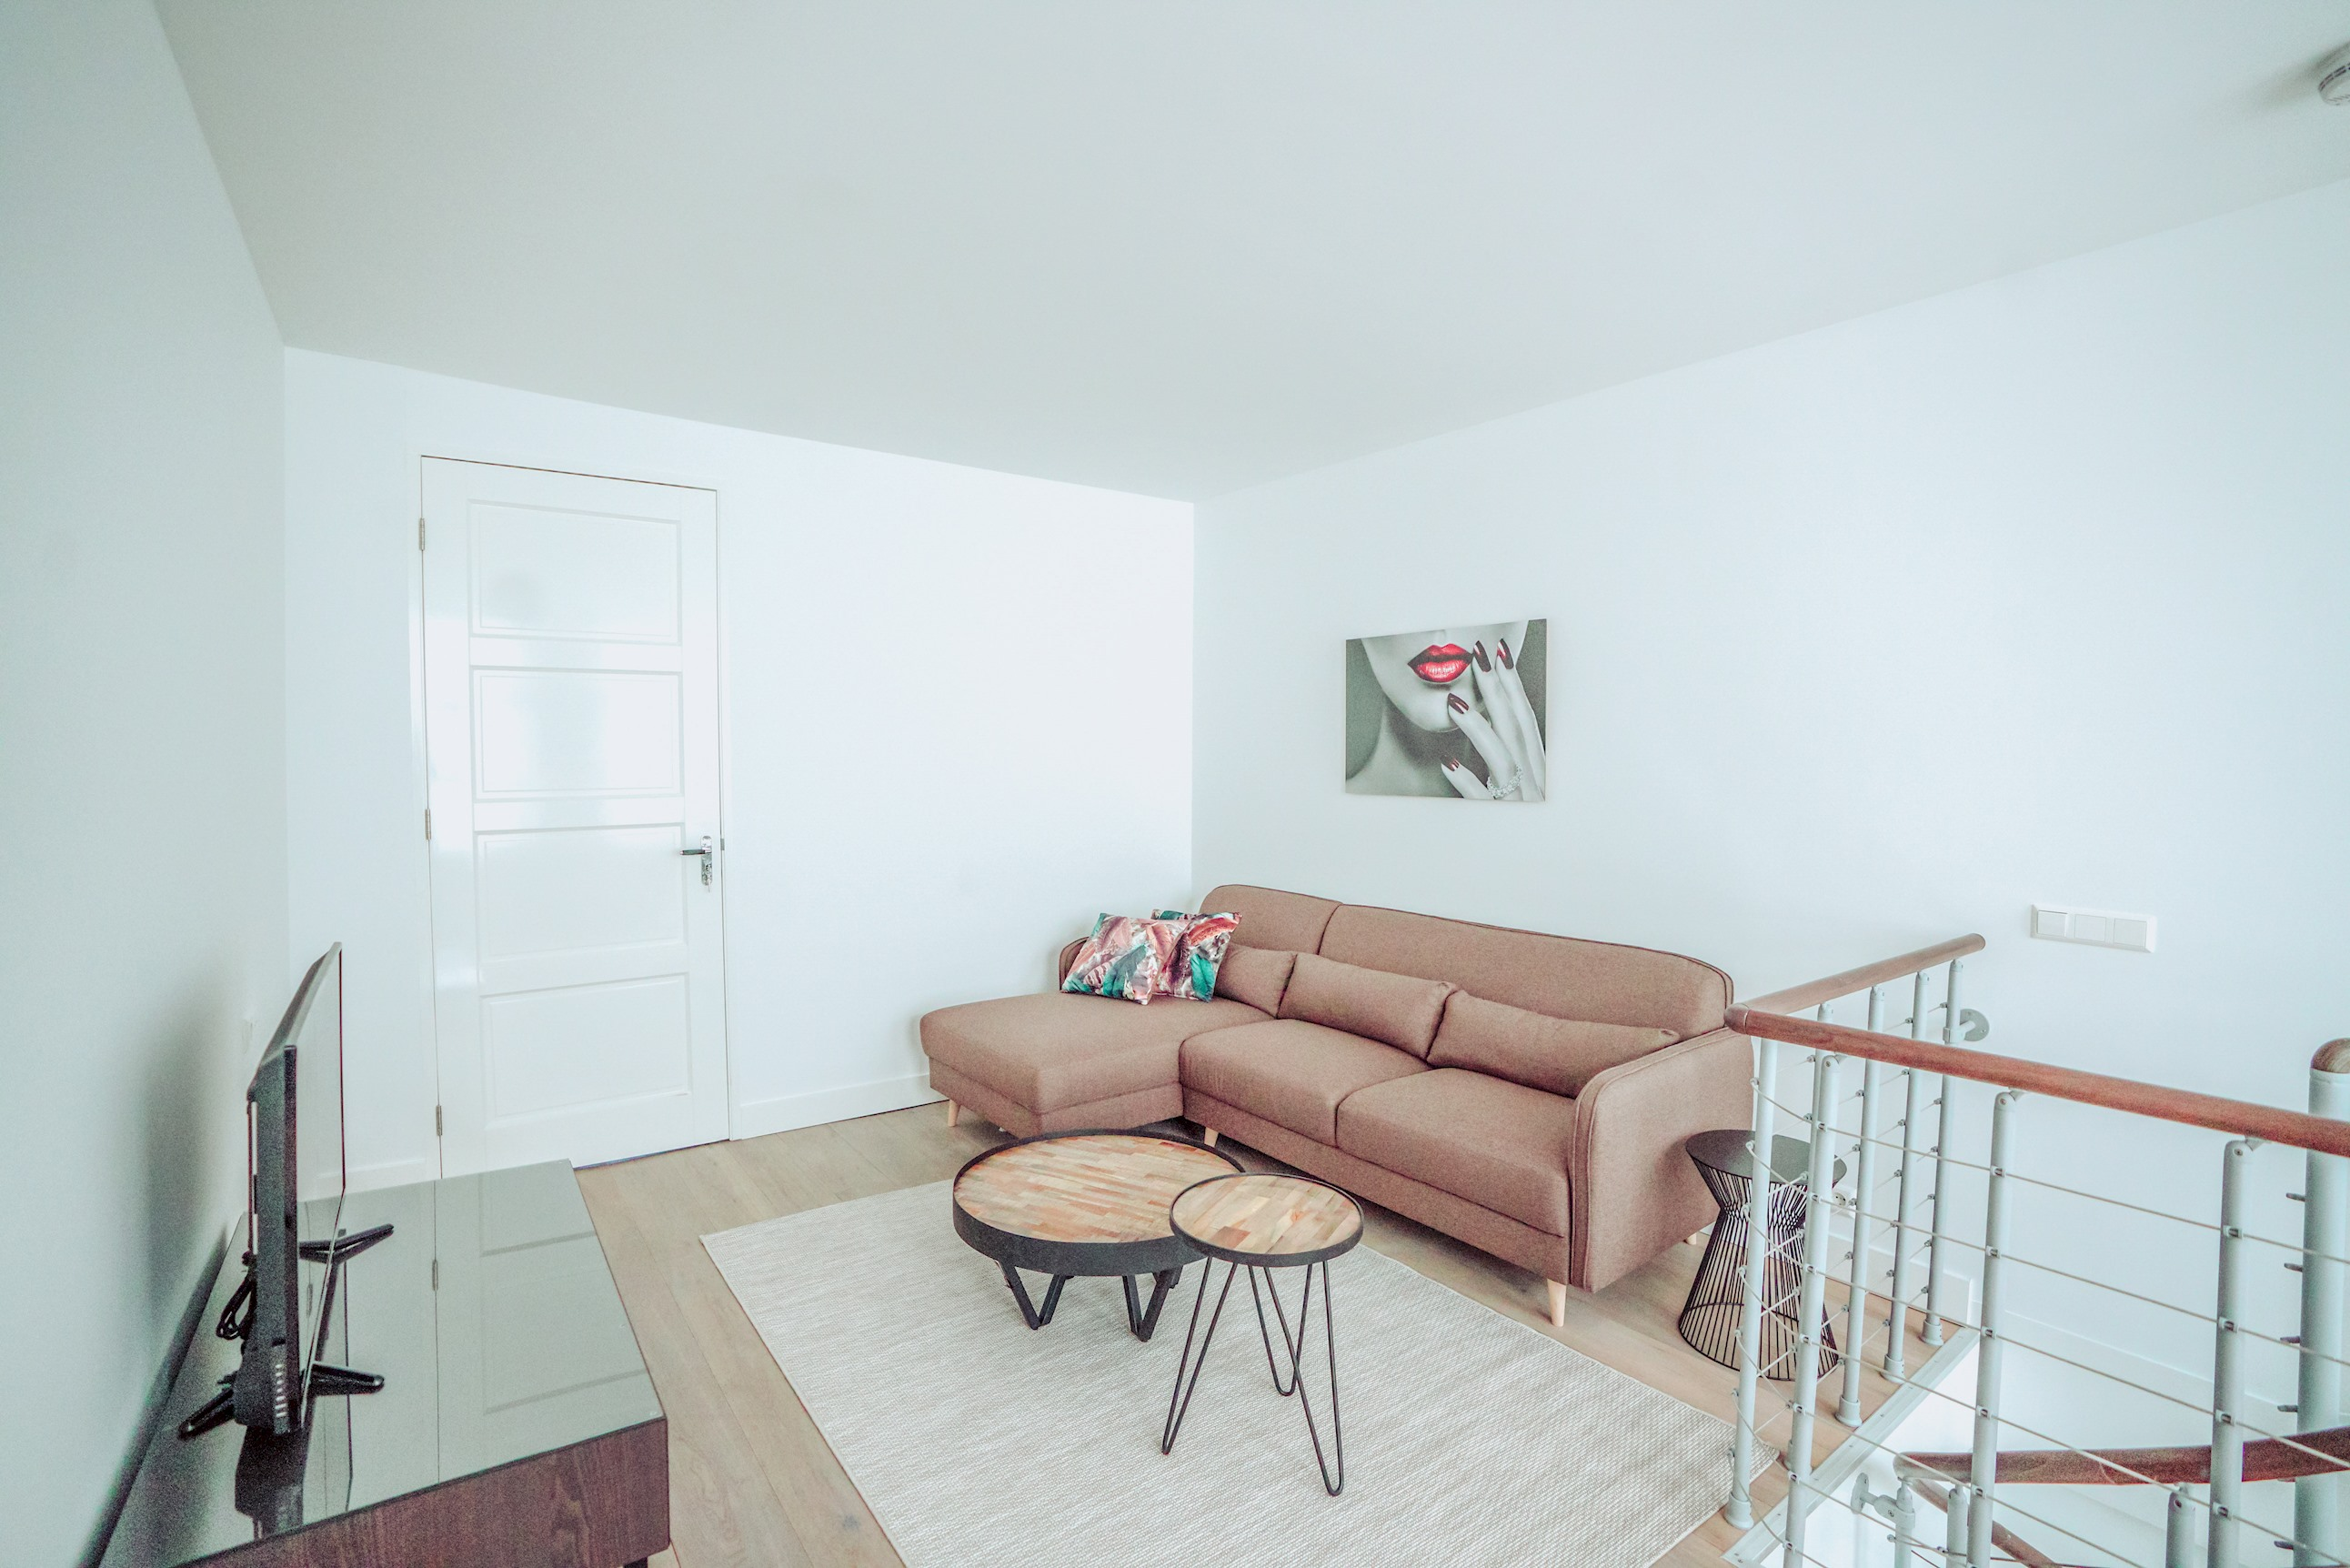 Amsterdam Apartments Leidsesquare First Floor Duplex photo 17002251